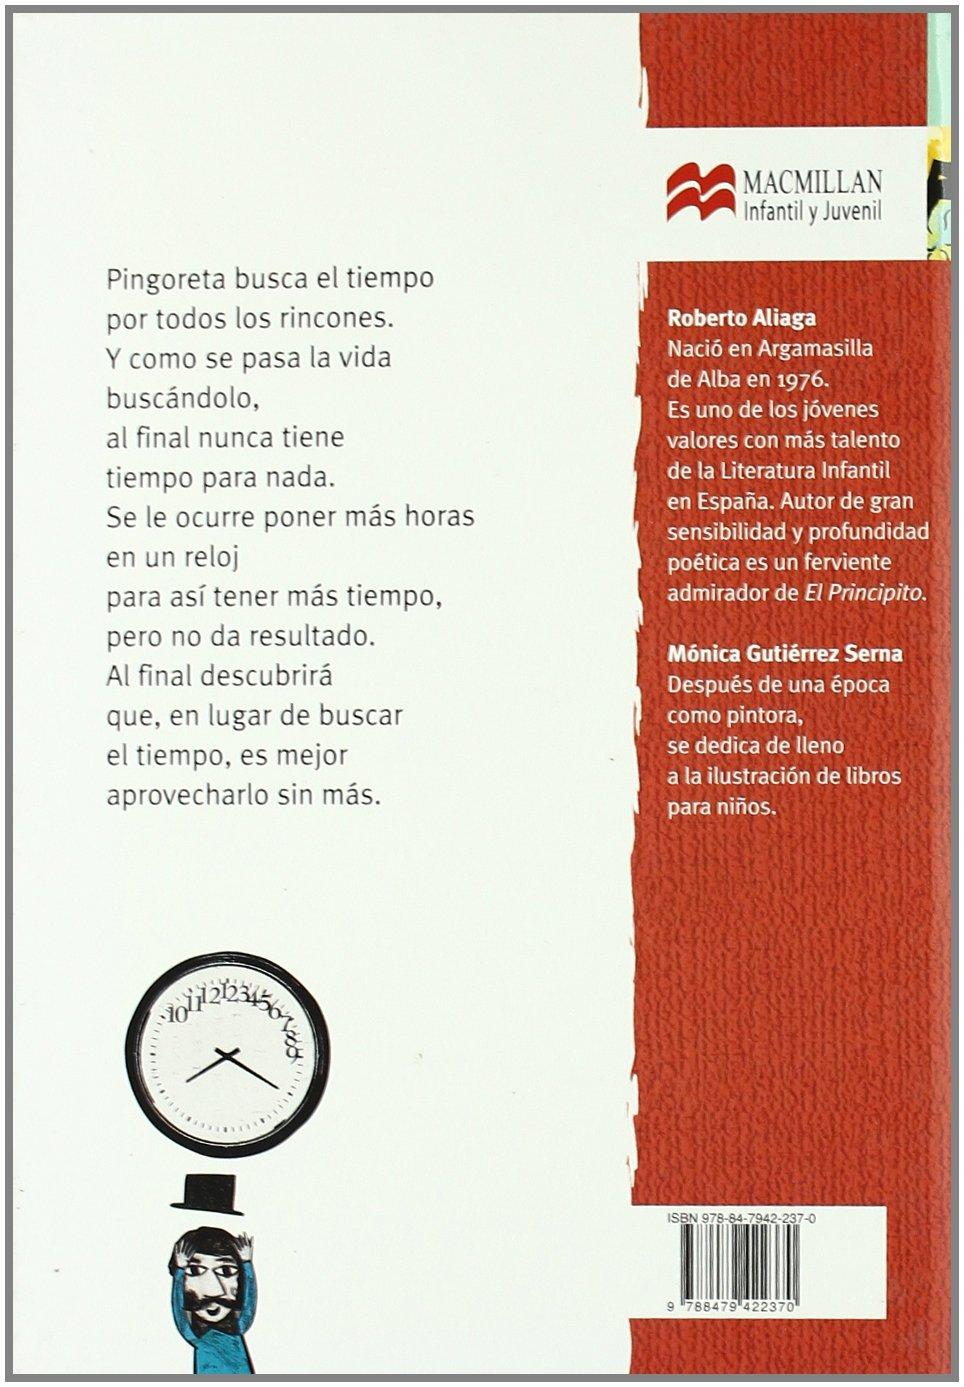 Amazon.com: Pingoreta y el tiempo (Librosaurio) (Spanish Edition) (9788479422370): Roberto Aliaga, Mónica Gutiérrez Serna: Books